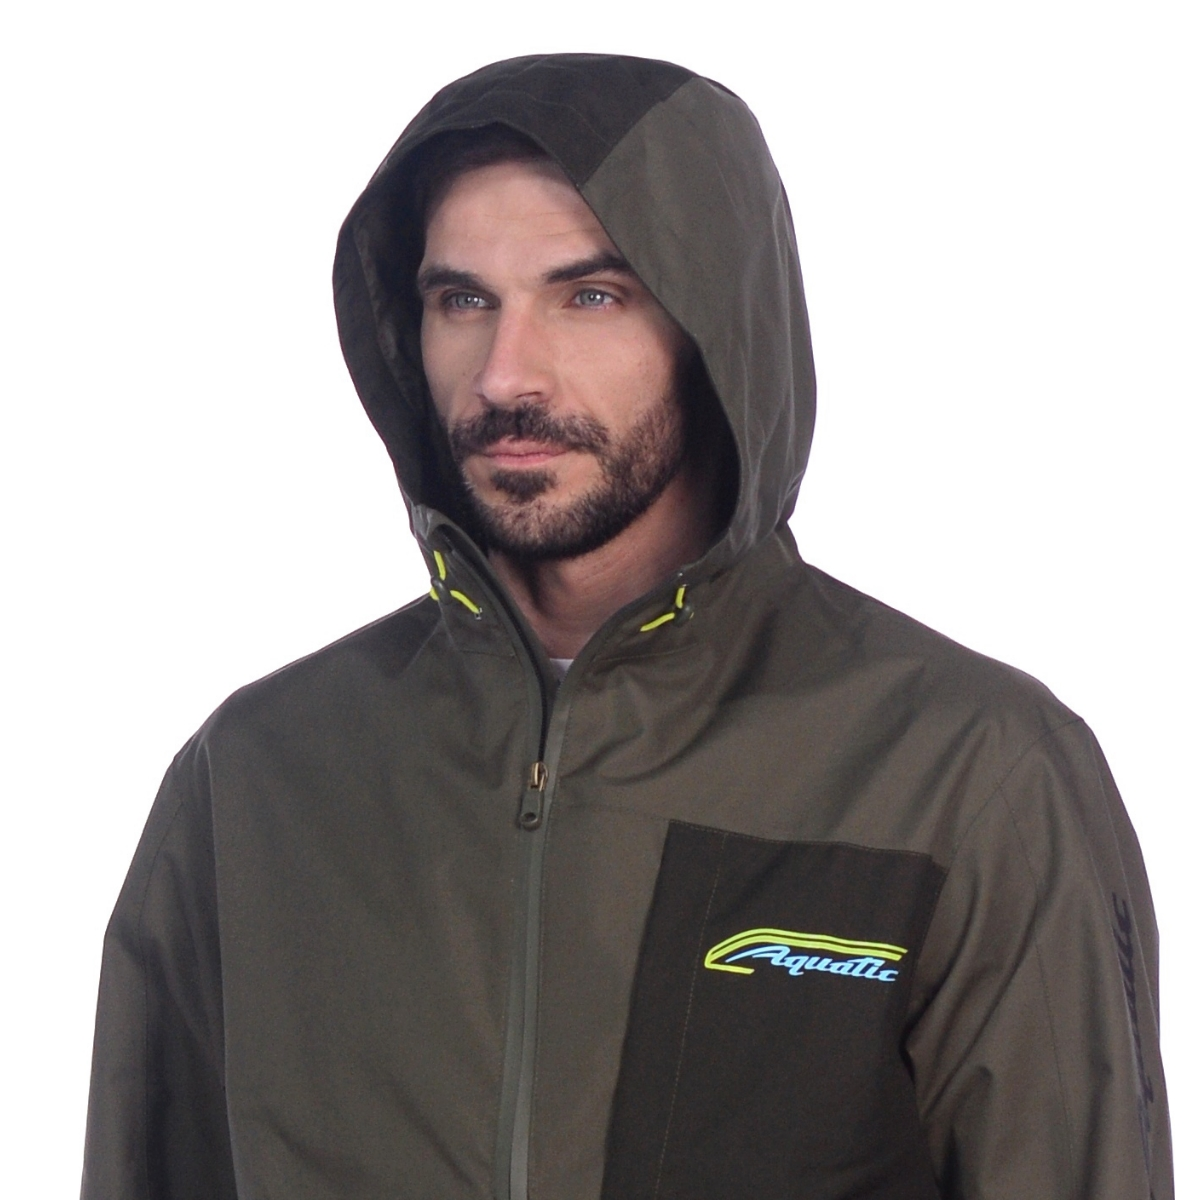 Куртка AQUATIC КД-02Х от дождя (мембрана)